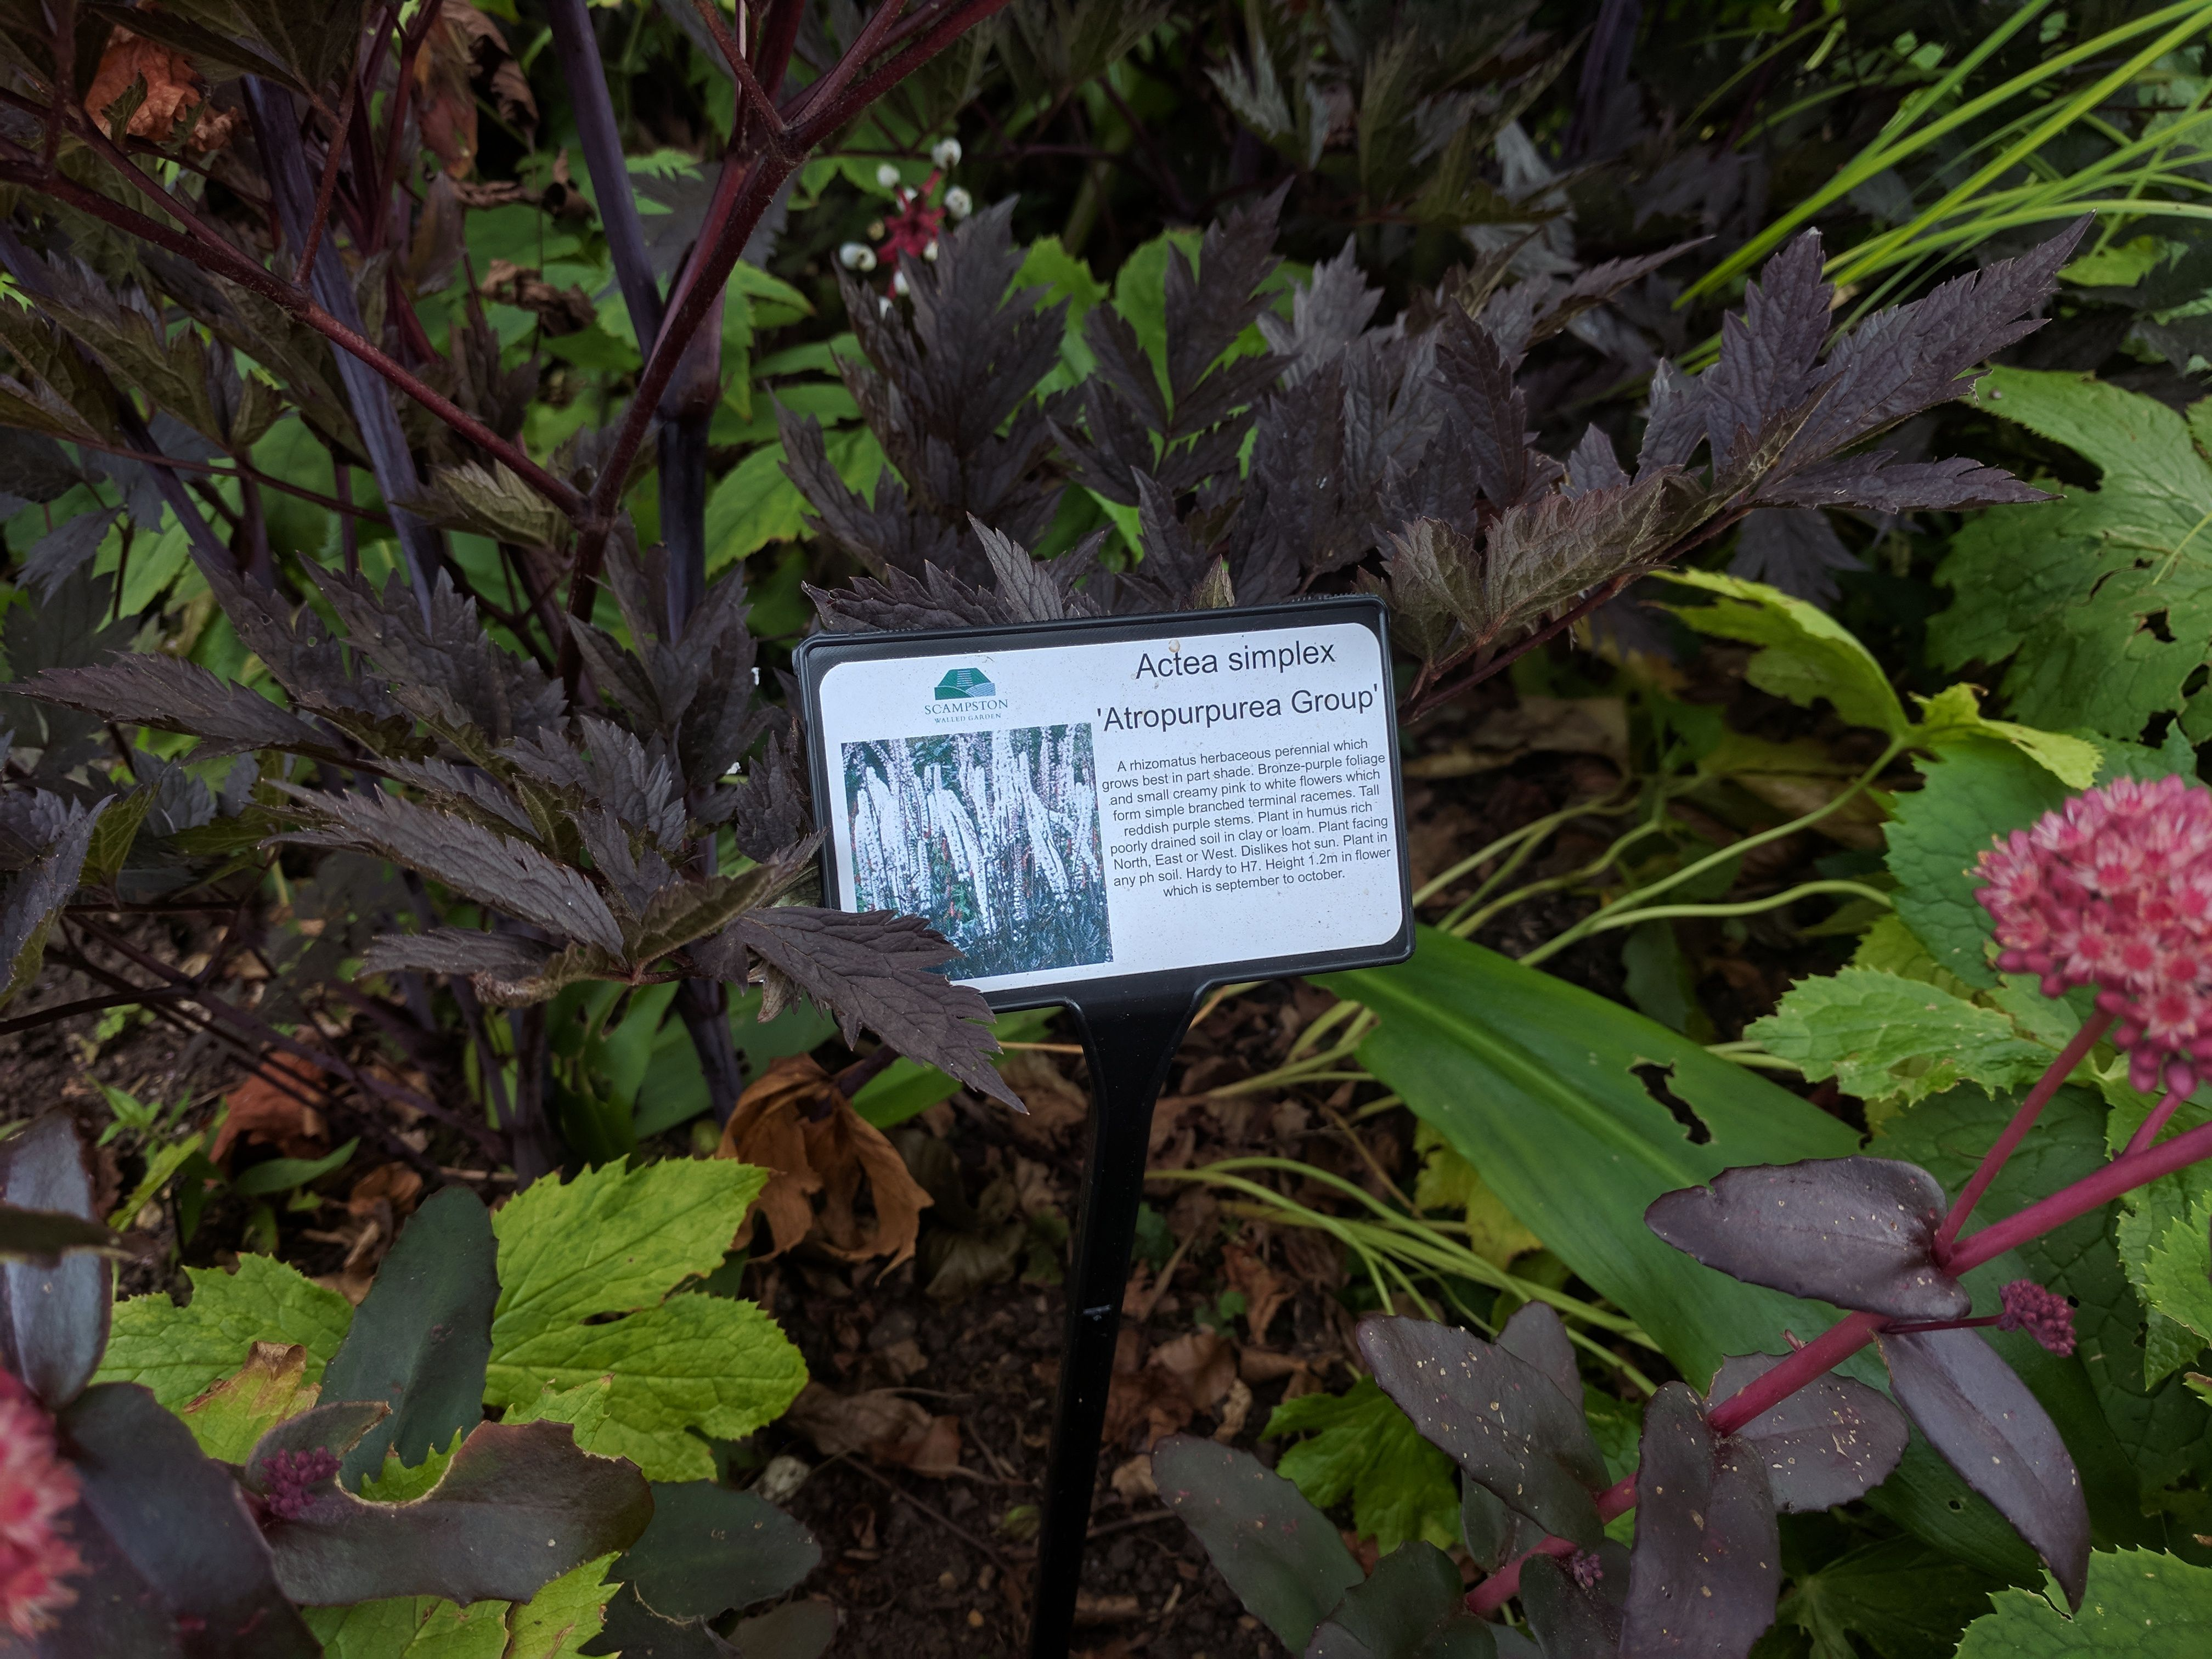 Pin by hc on plants pinterest plants